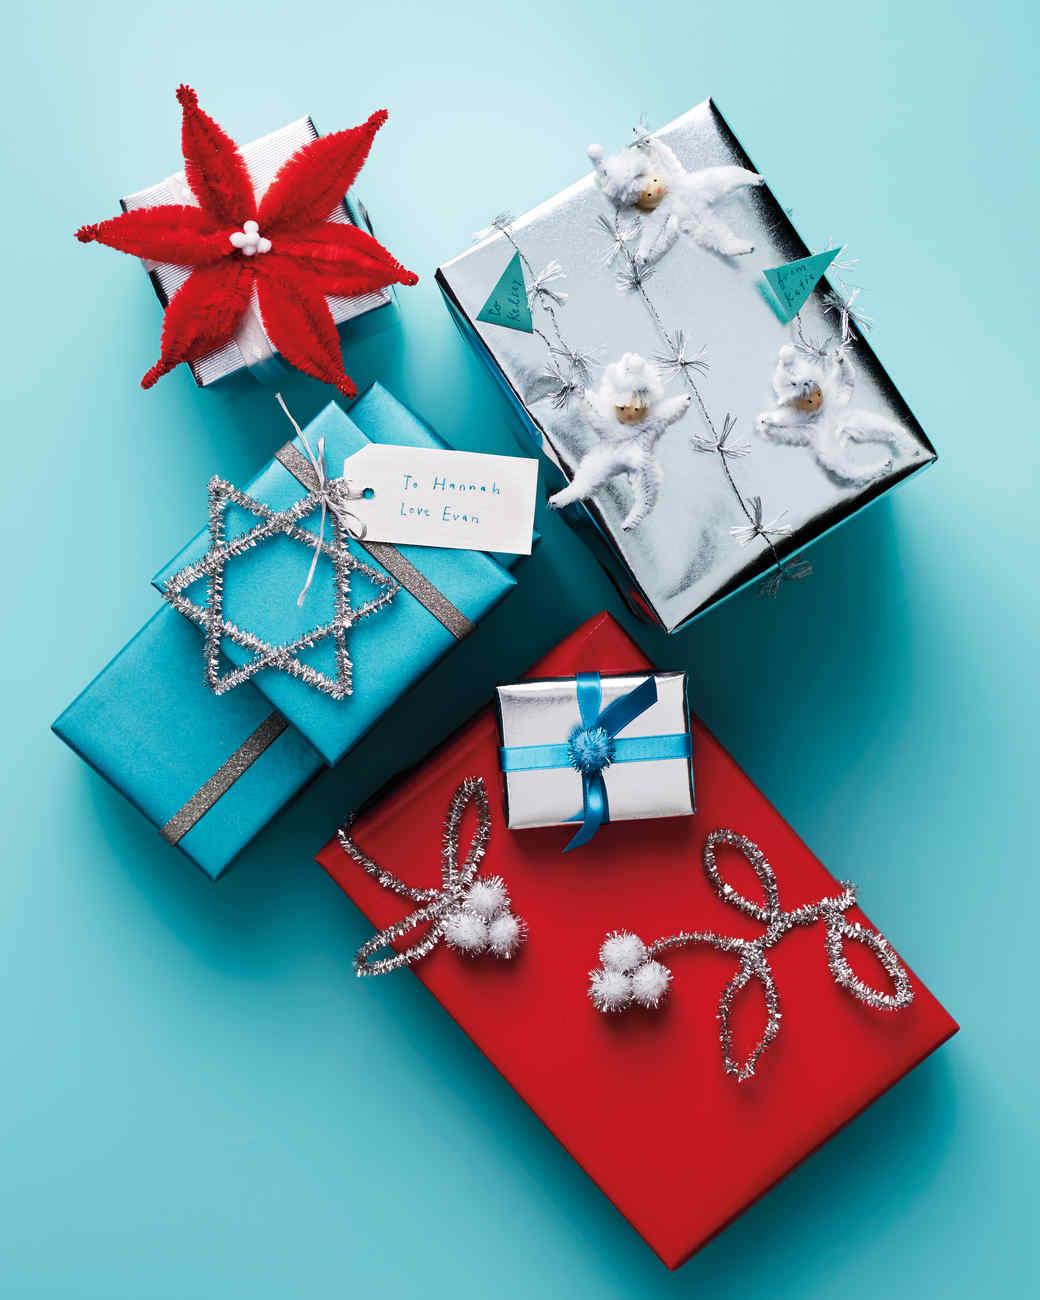 gift-tags-1-0040-d111506.jpg